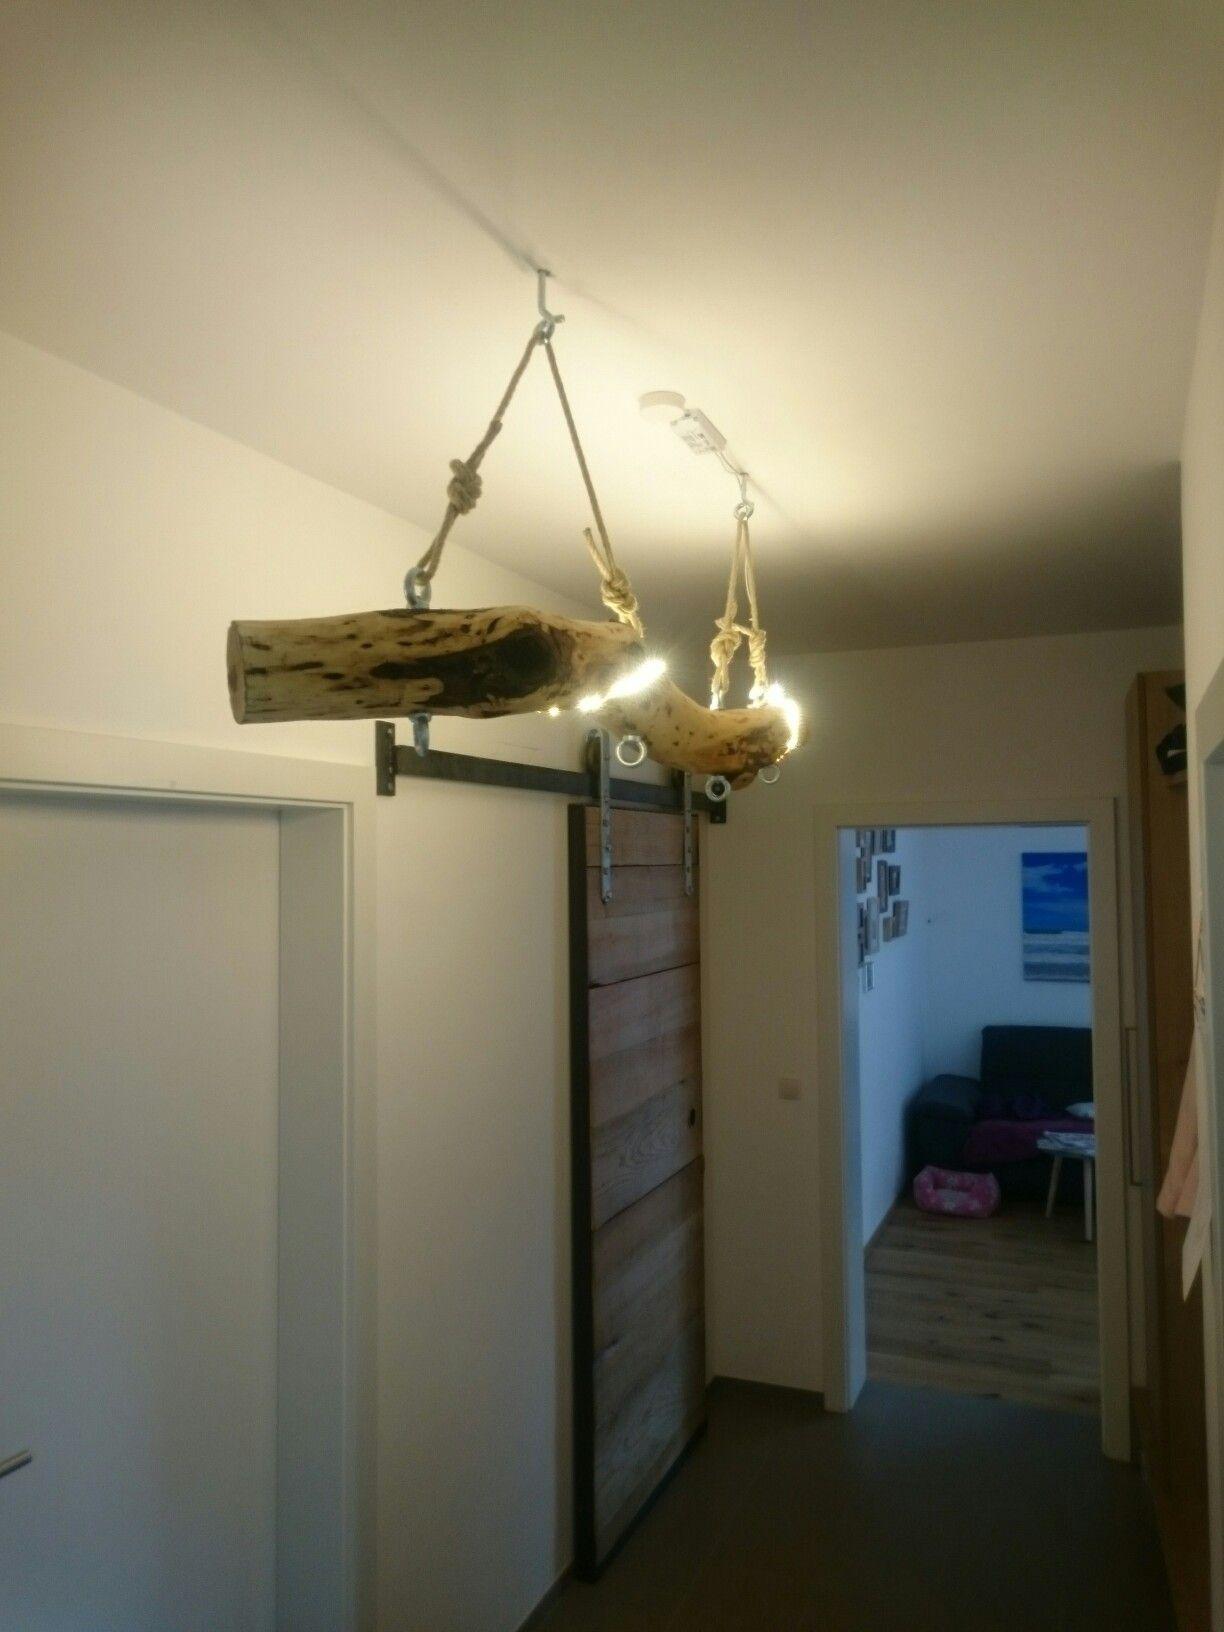 Eschenholz Mit Led Leiste Umwickelt Boomstam Woodlamp